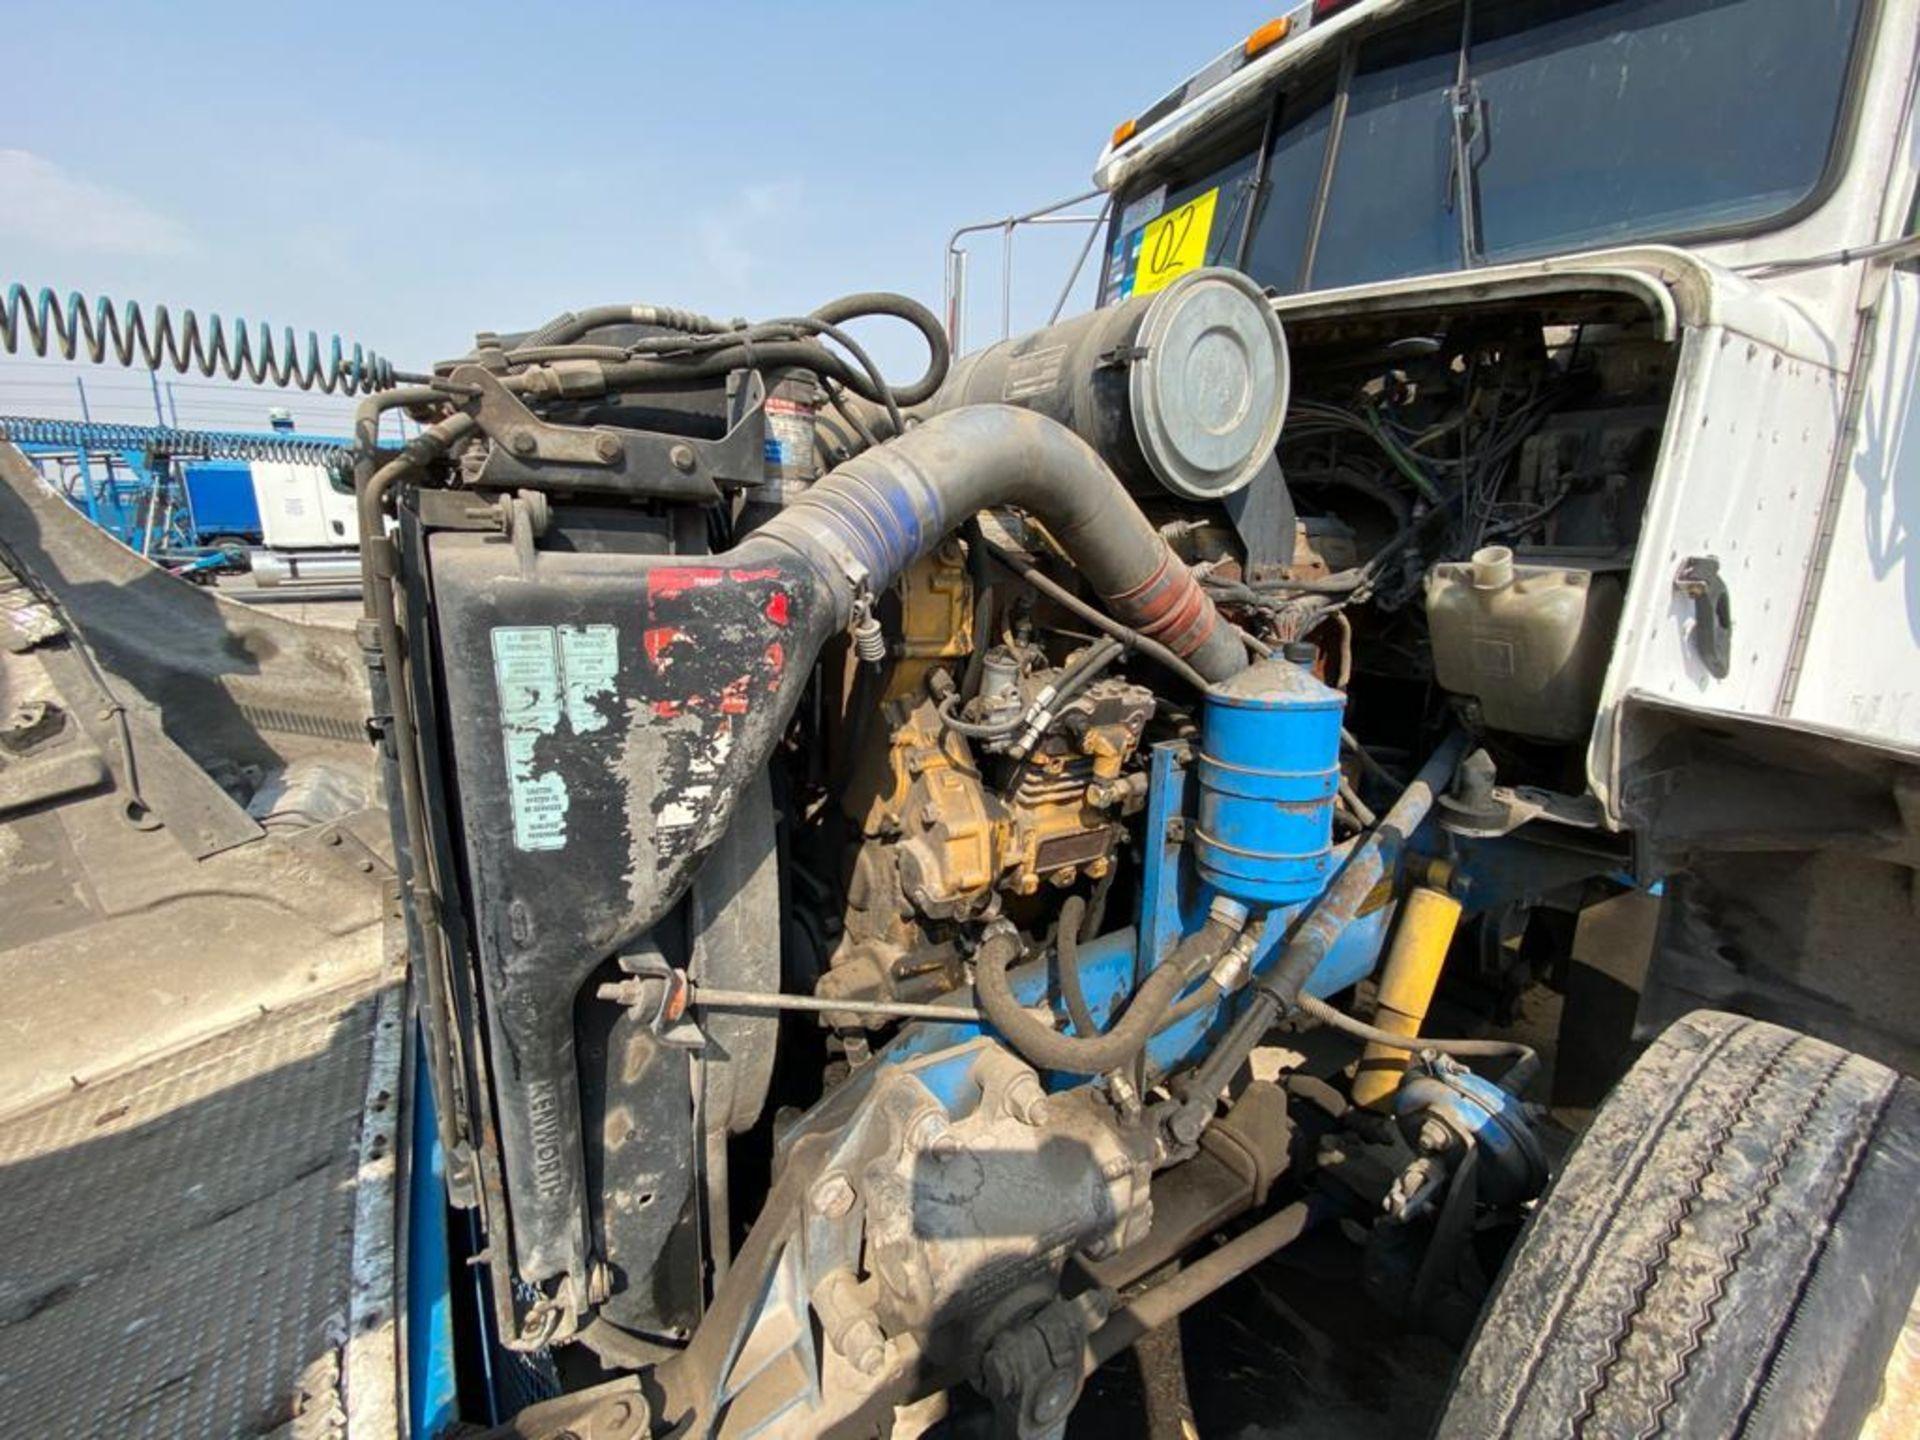 1999 Kenworth Sleeper truck tractor, standard transmission of 18 speeds - Image 66 of 75